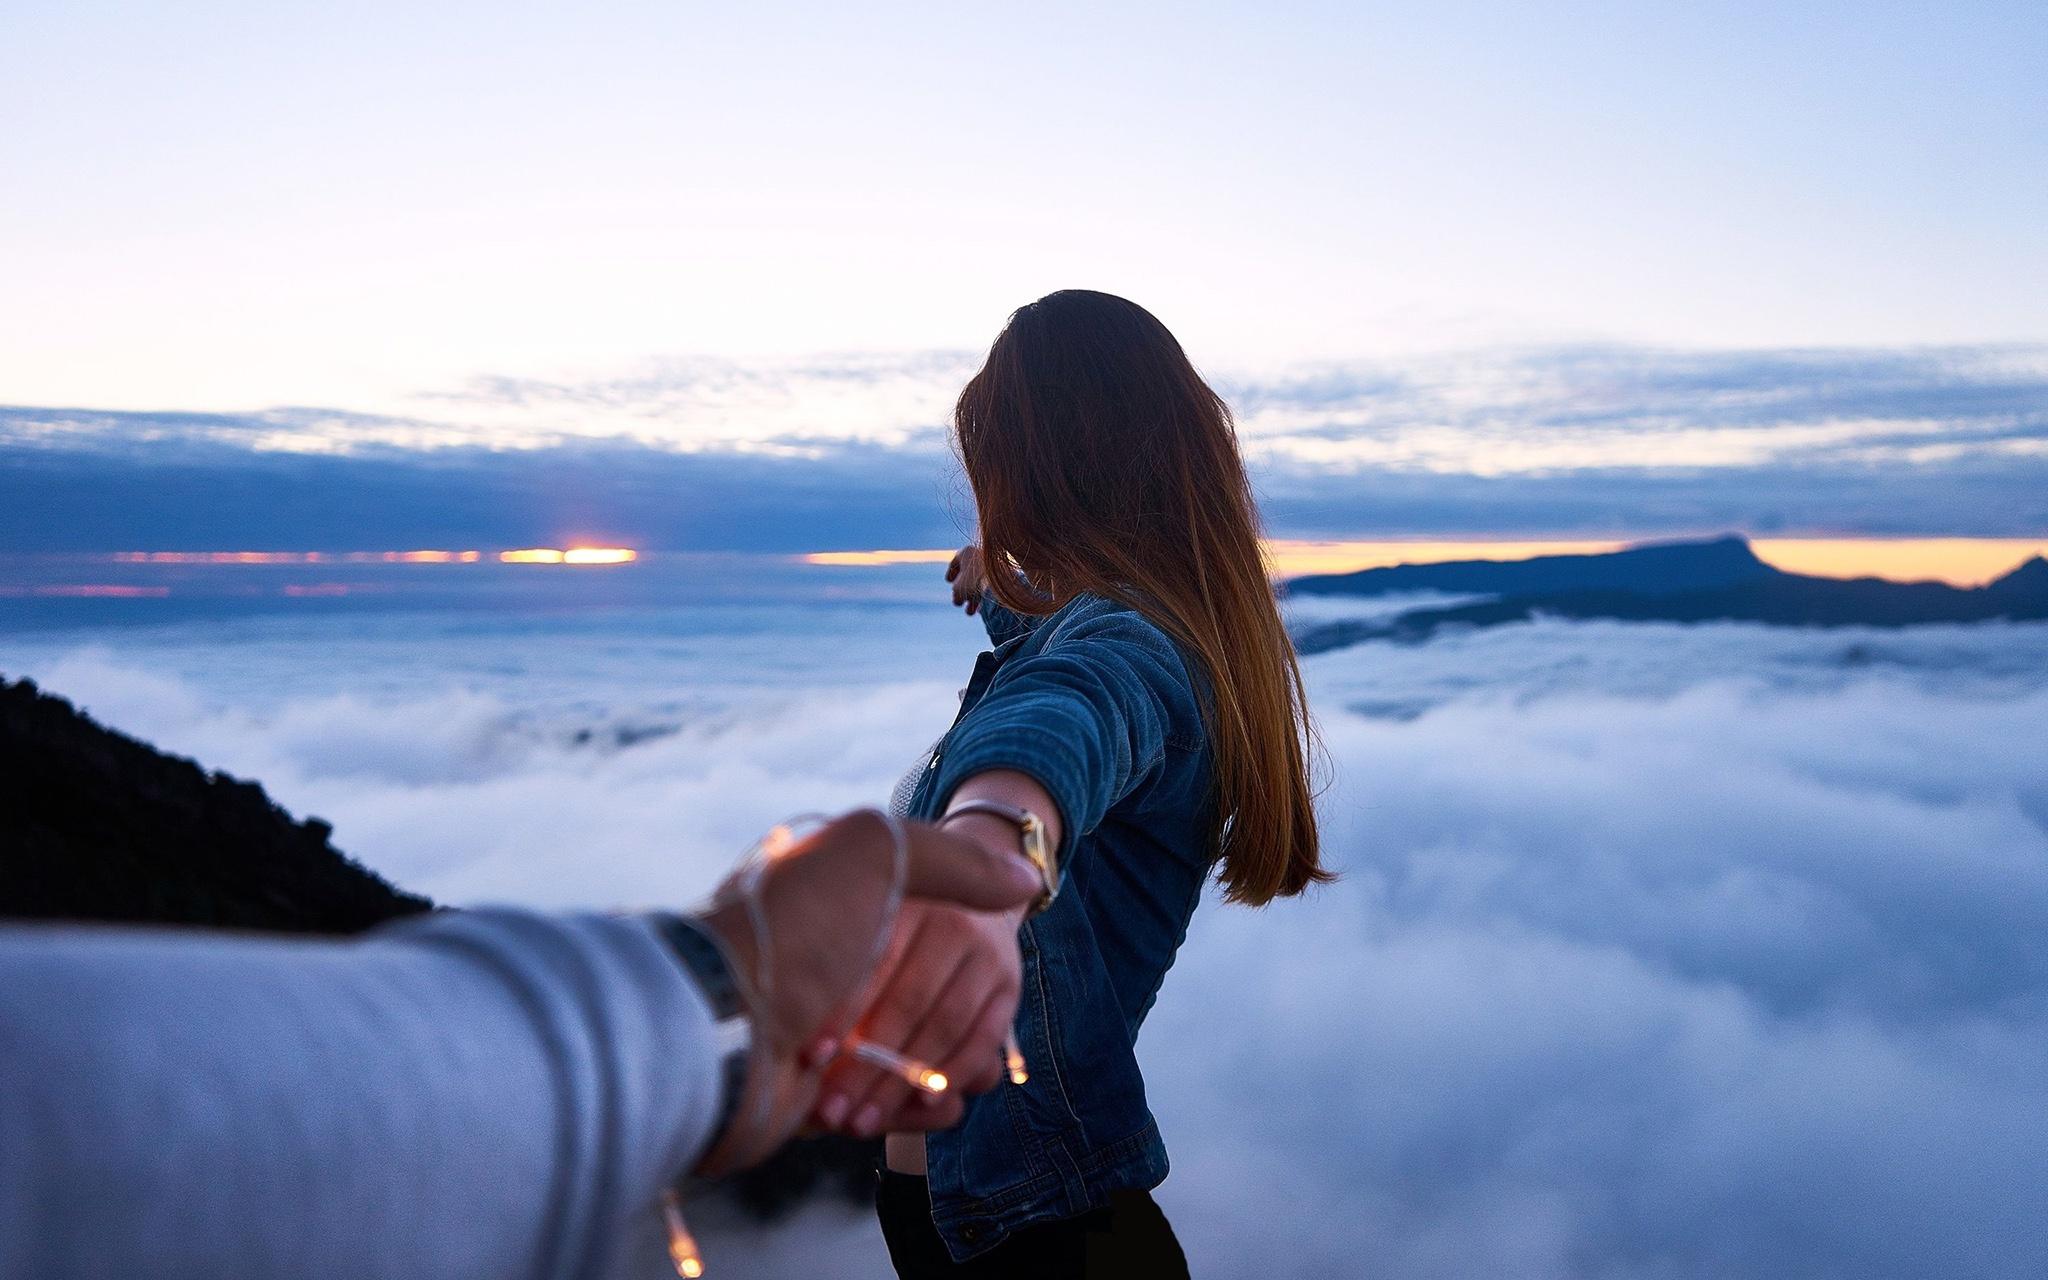 Картинки девушка тянет руки к парню